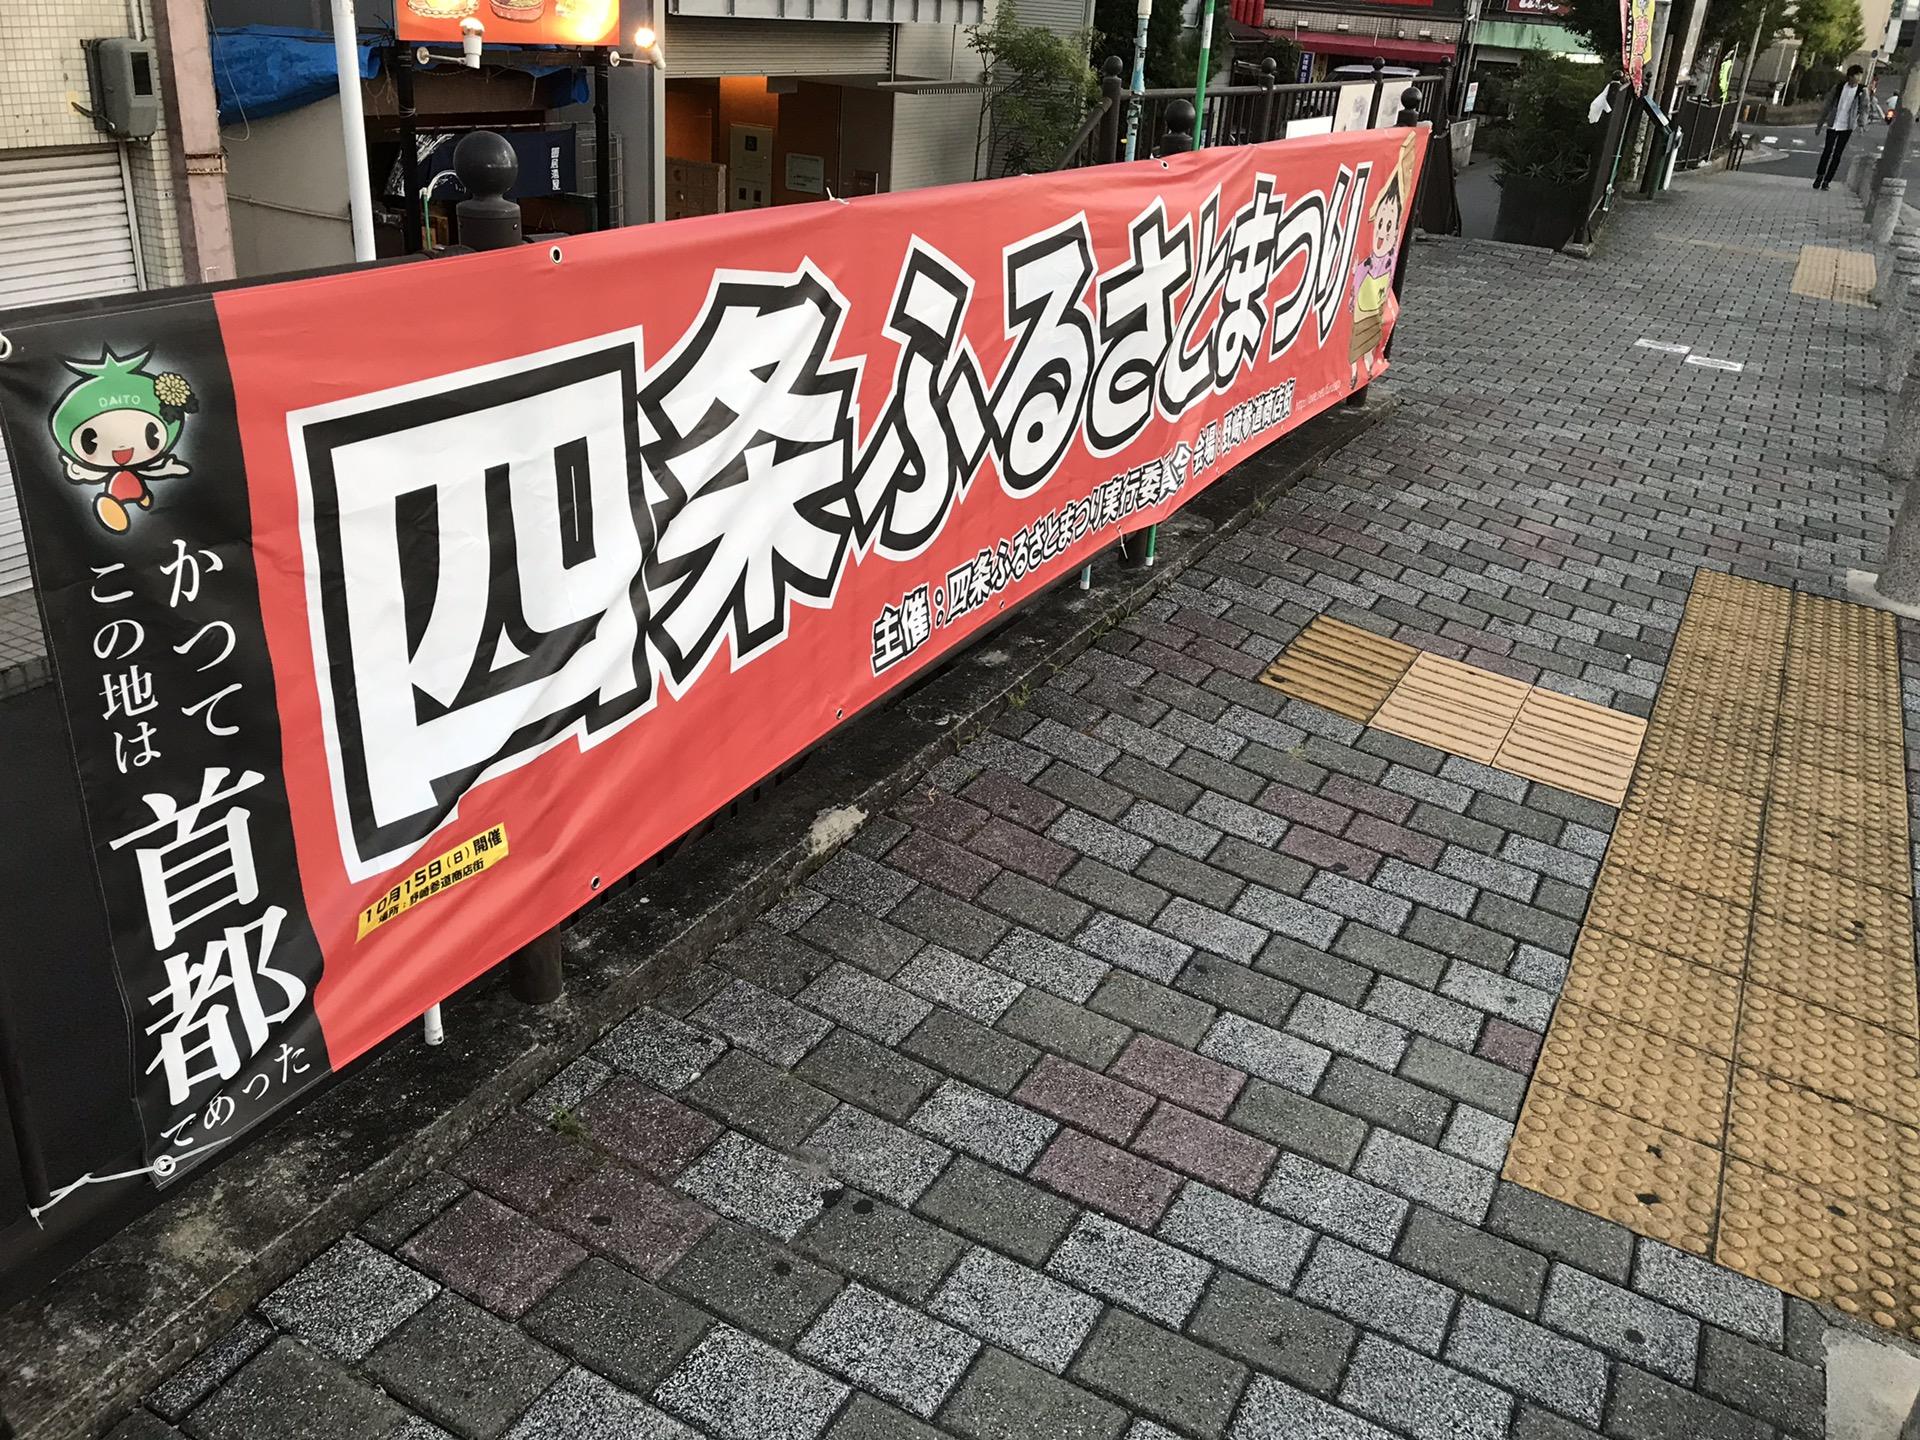 JR野崎駅前に 10/15 四条ふるさとまつり 大きな横断幕設置しました。